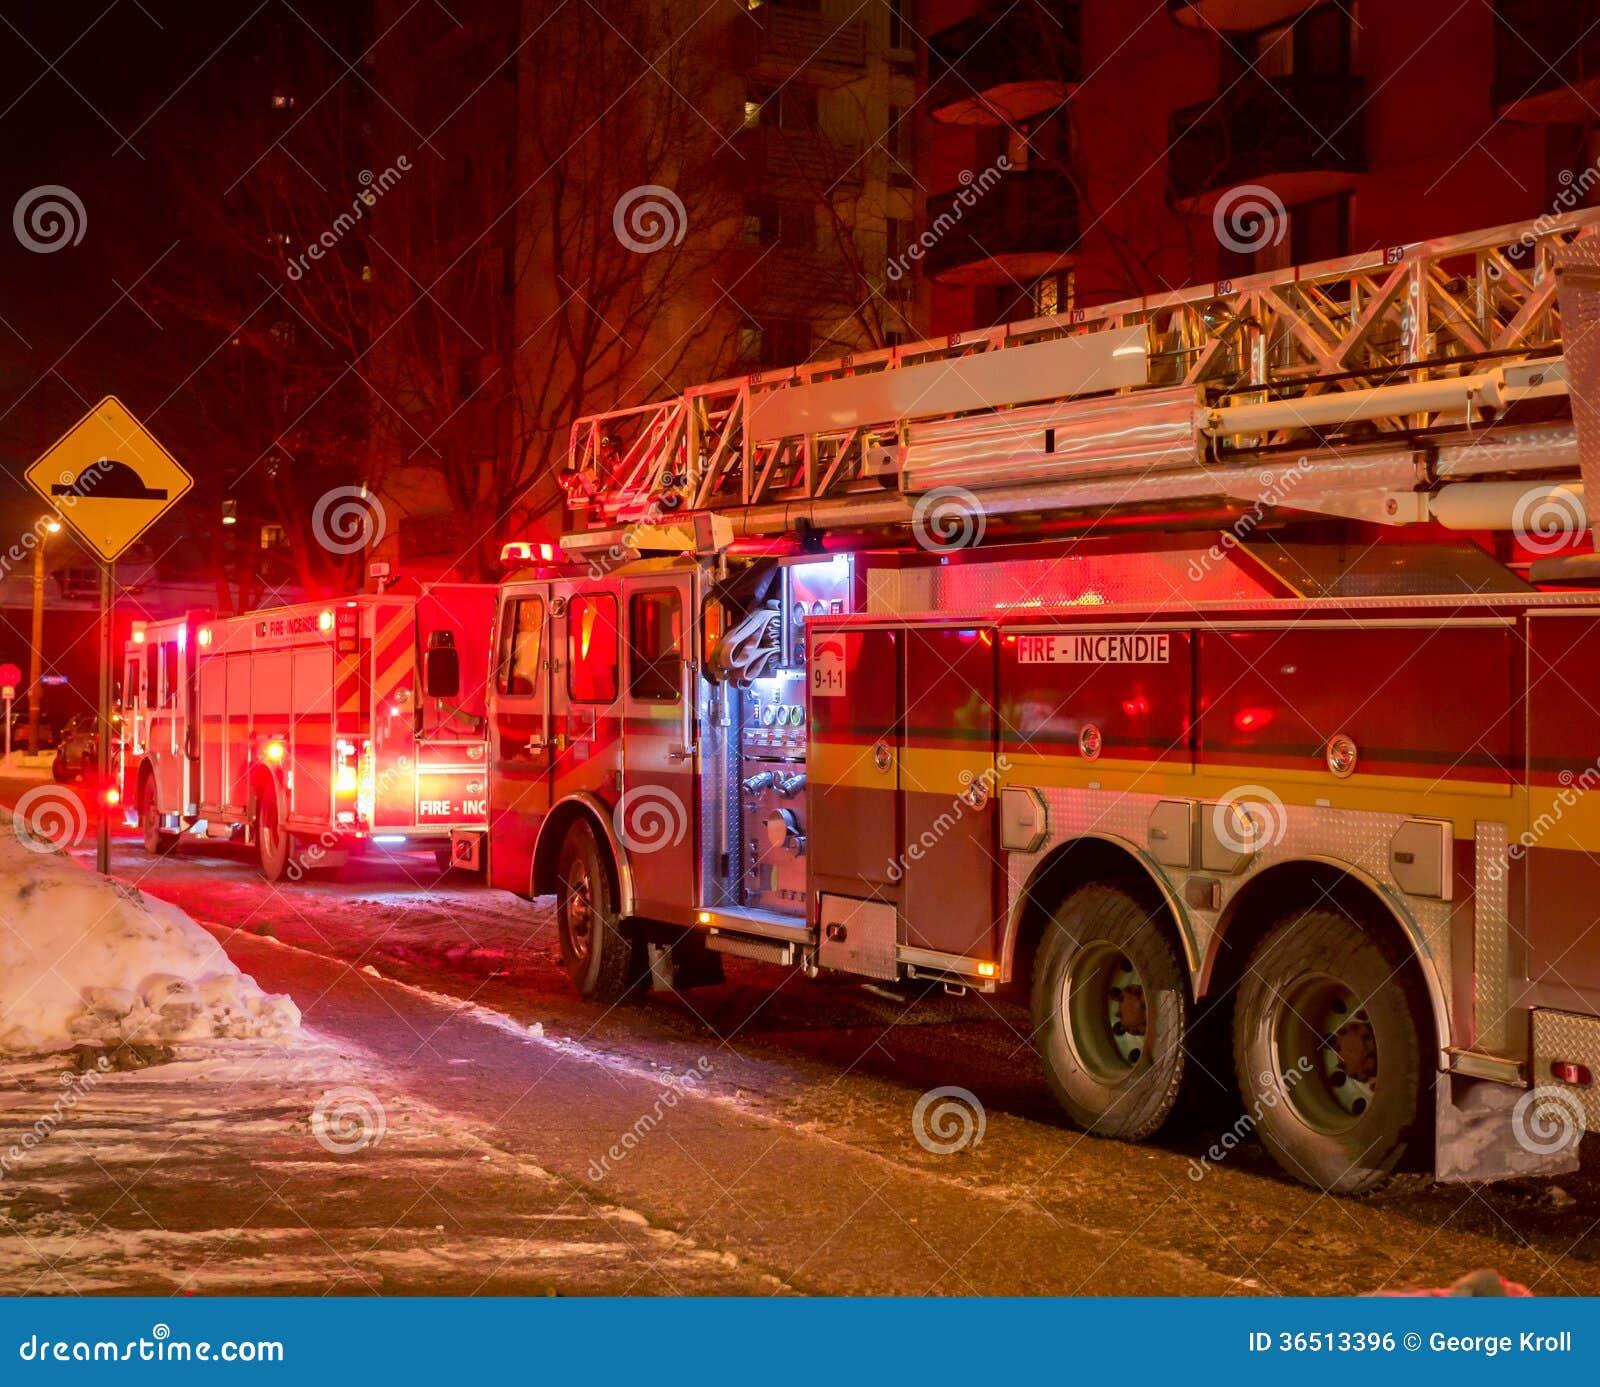 Firetrucks winter night